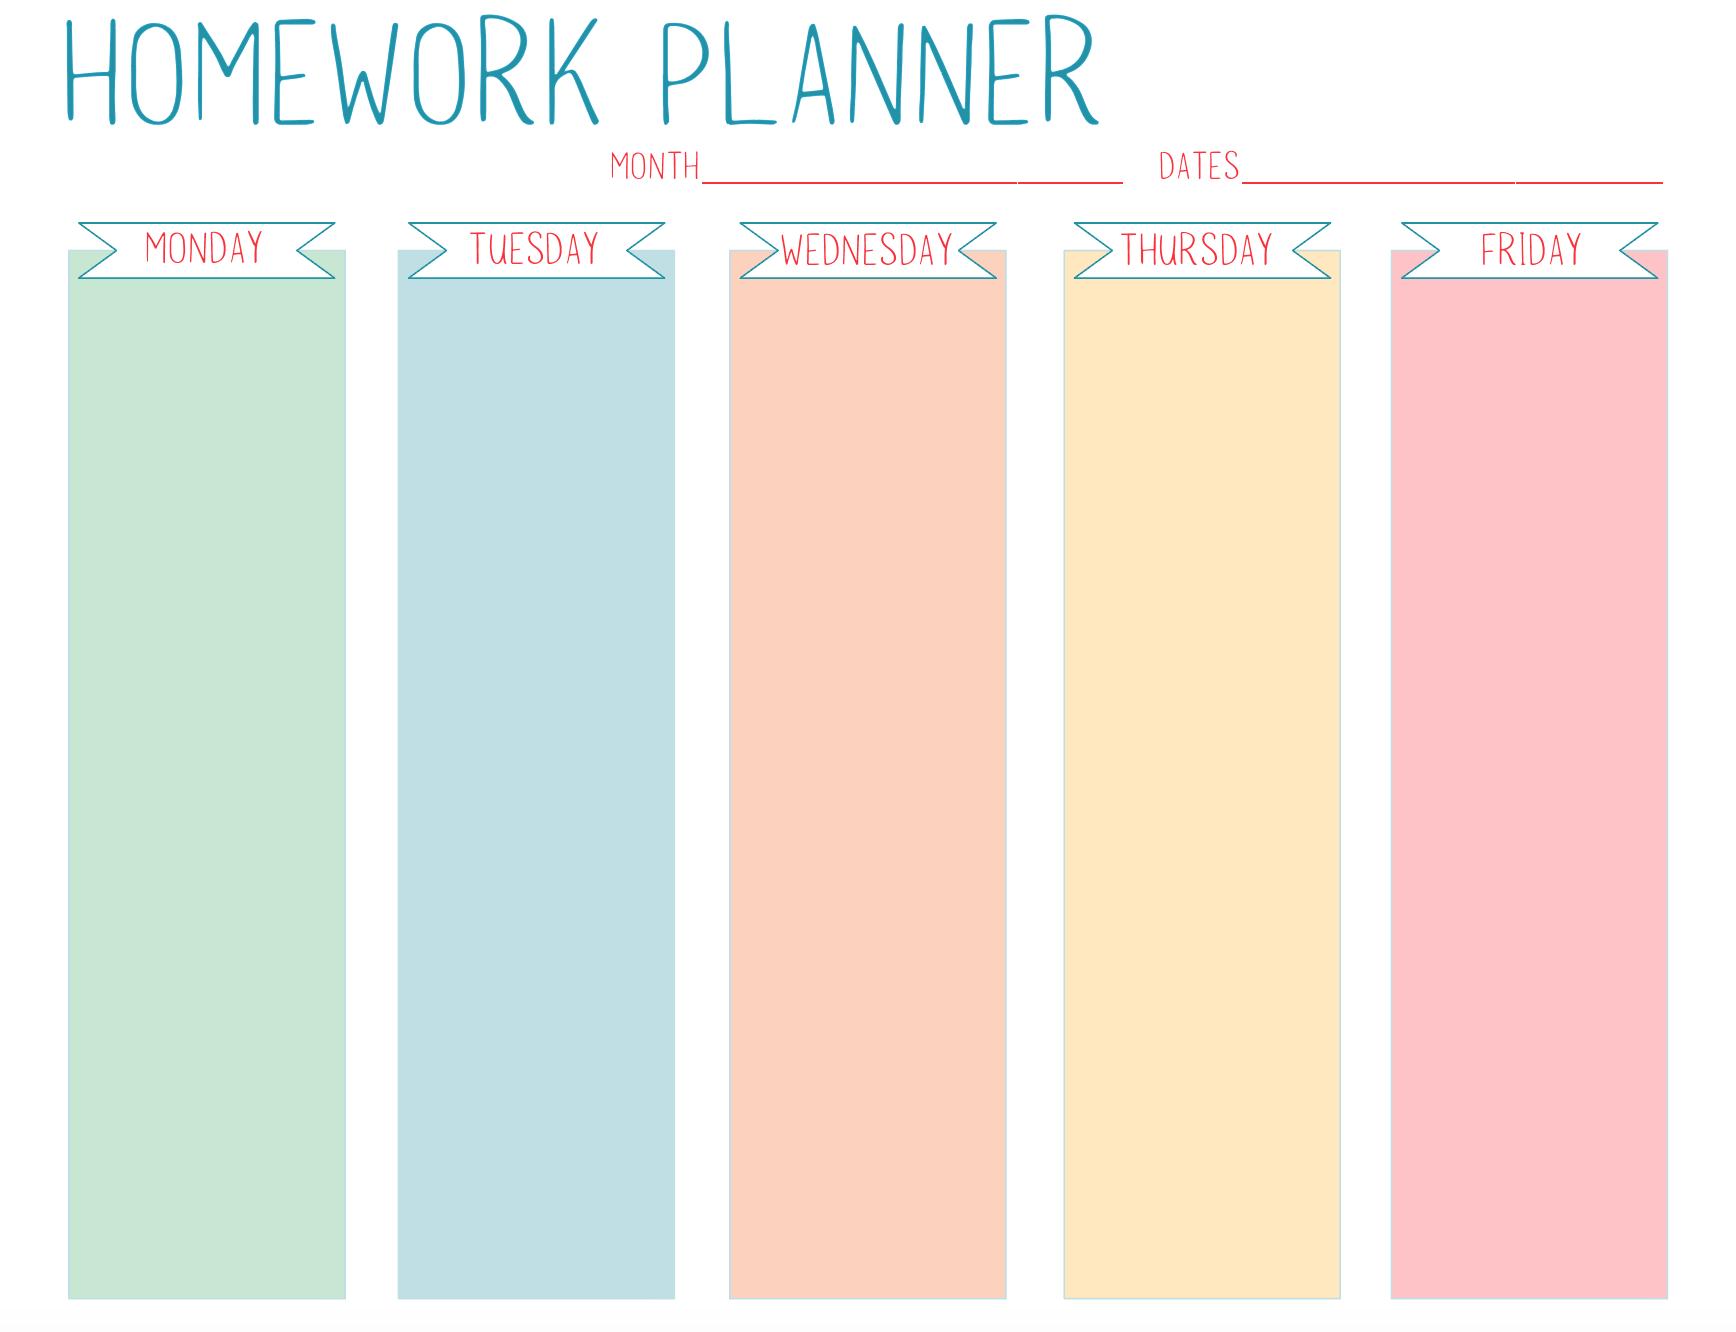 Free Printable Homework Planner For Students